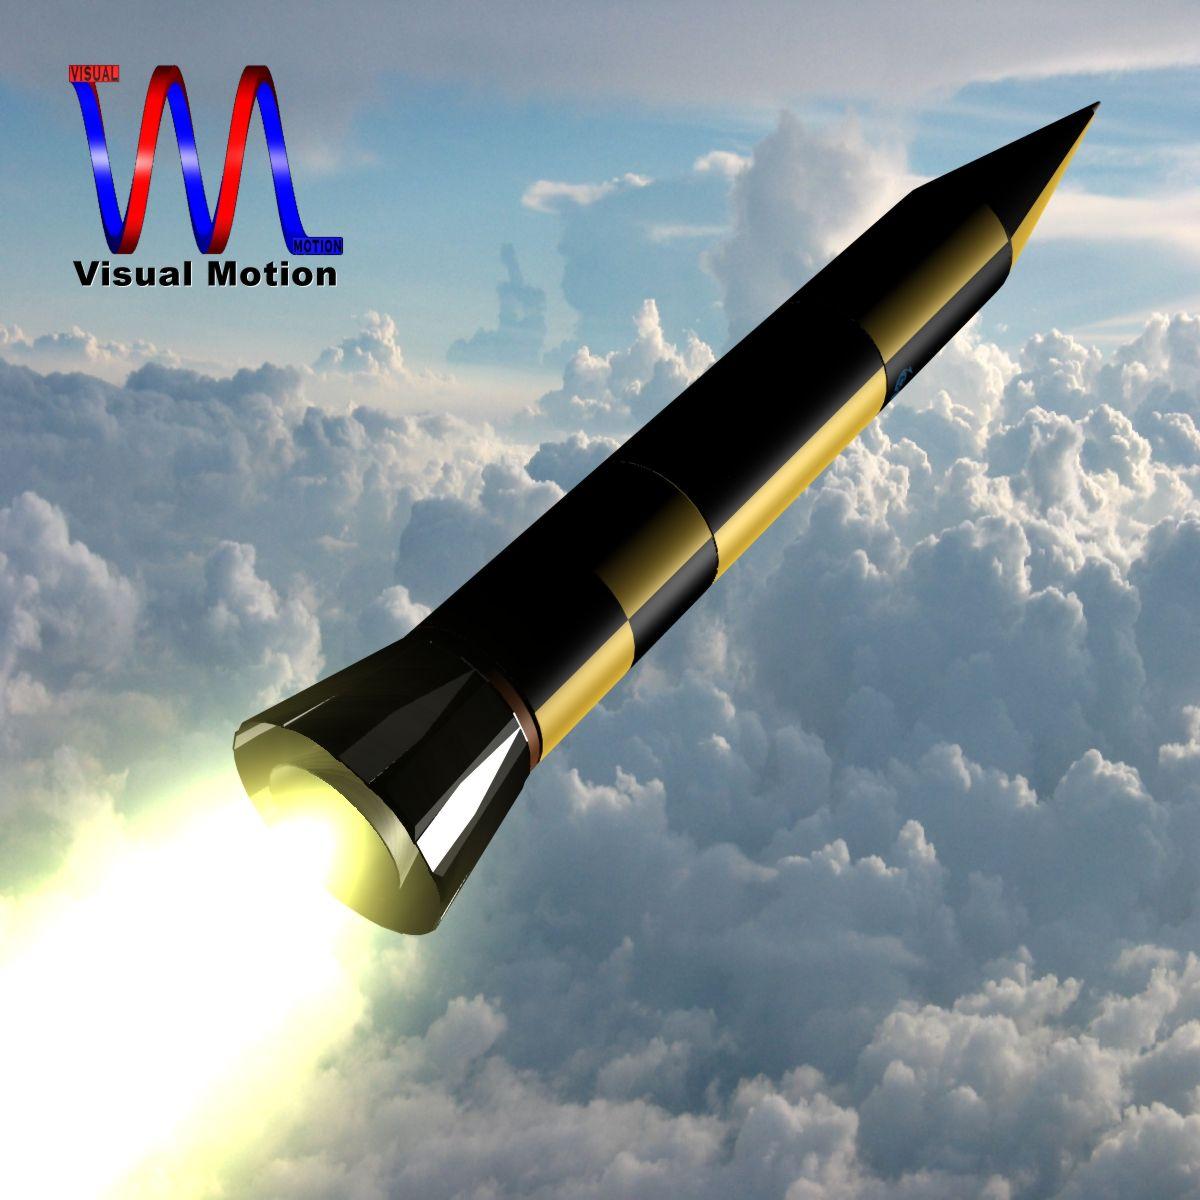 israeli arrow 3 missile 3d model 3ds dxf cob x other obj 136282